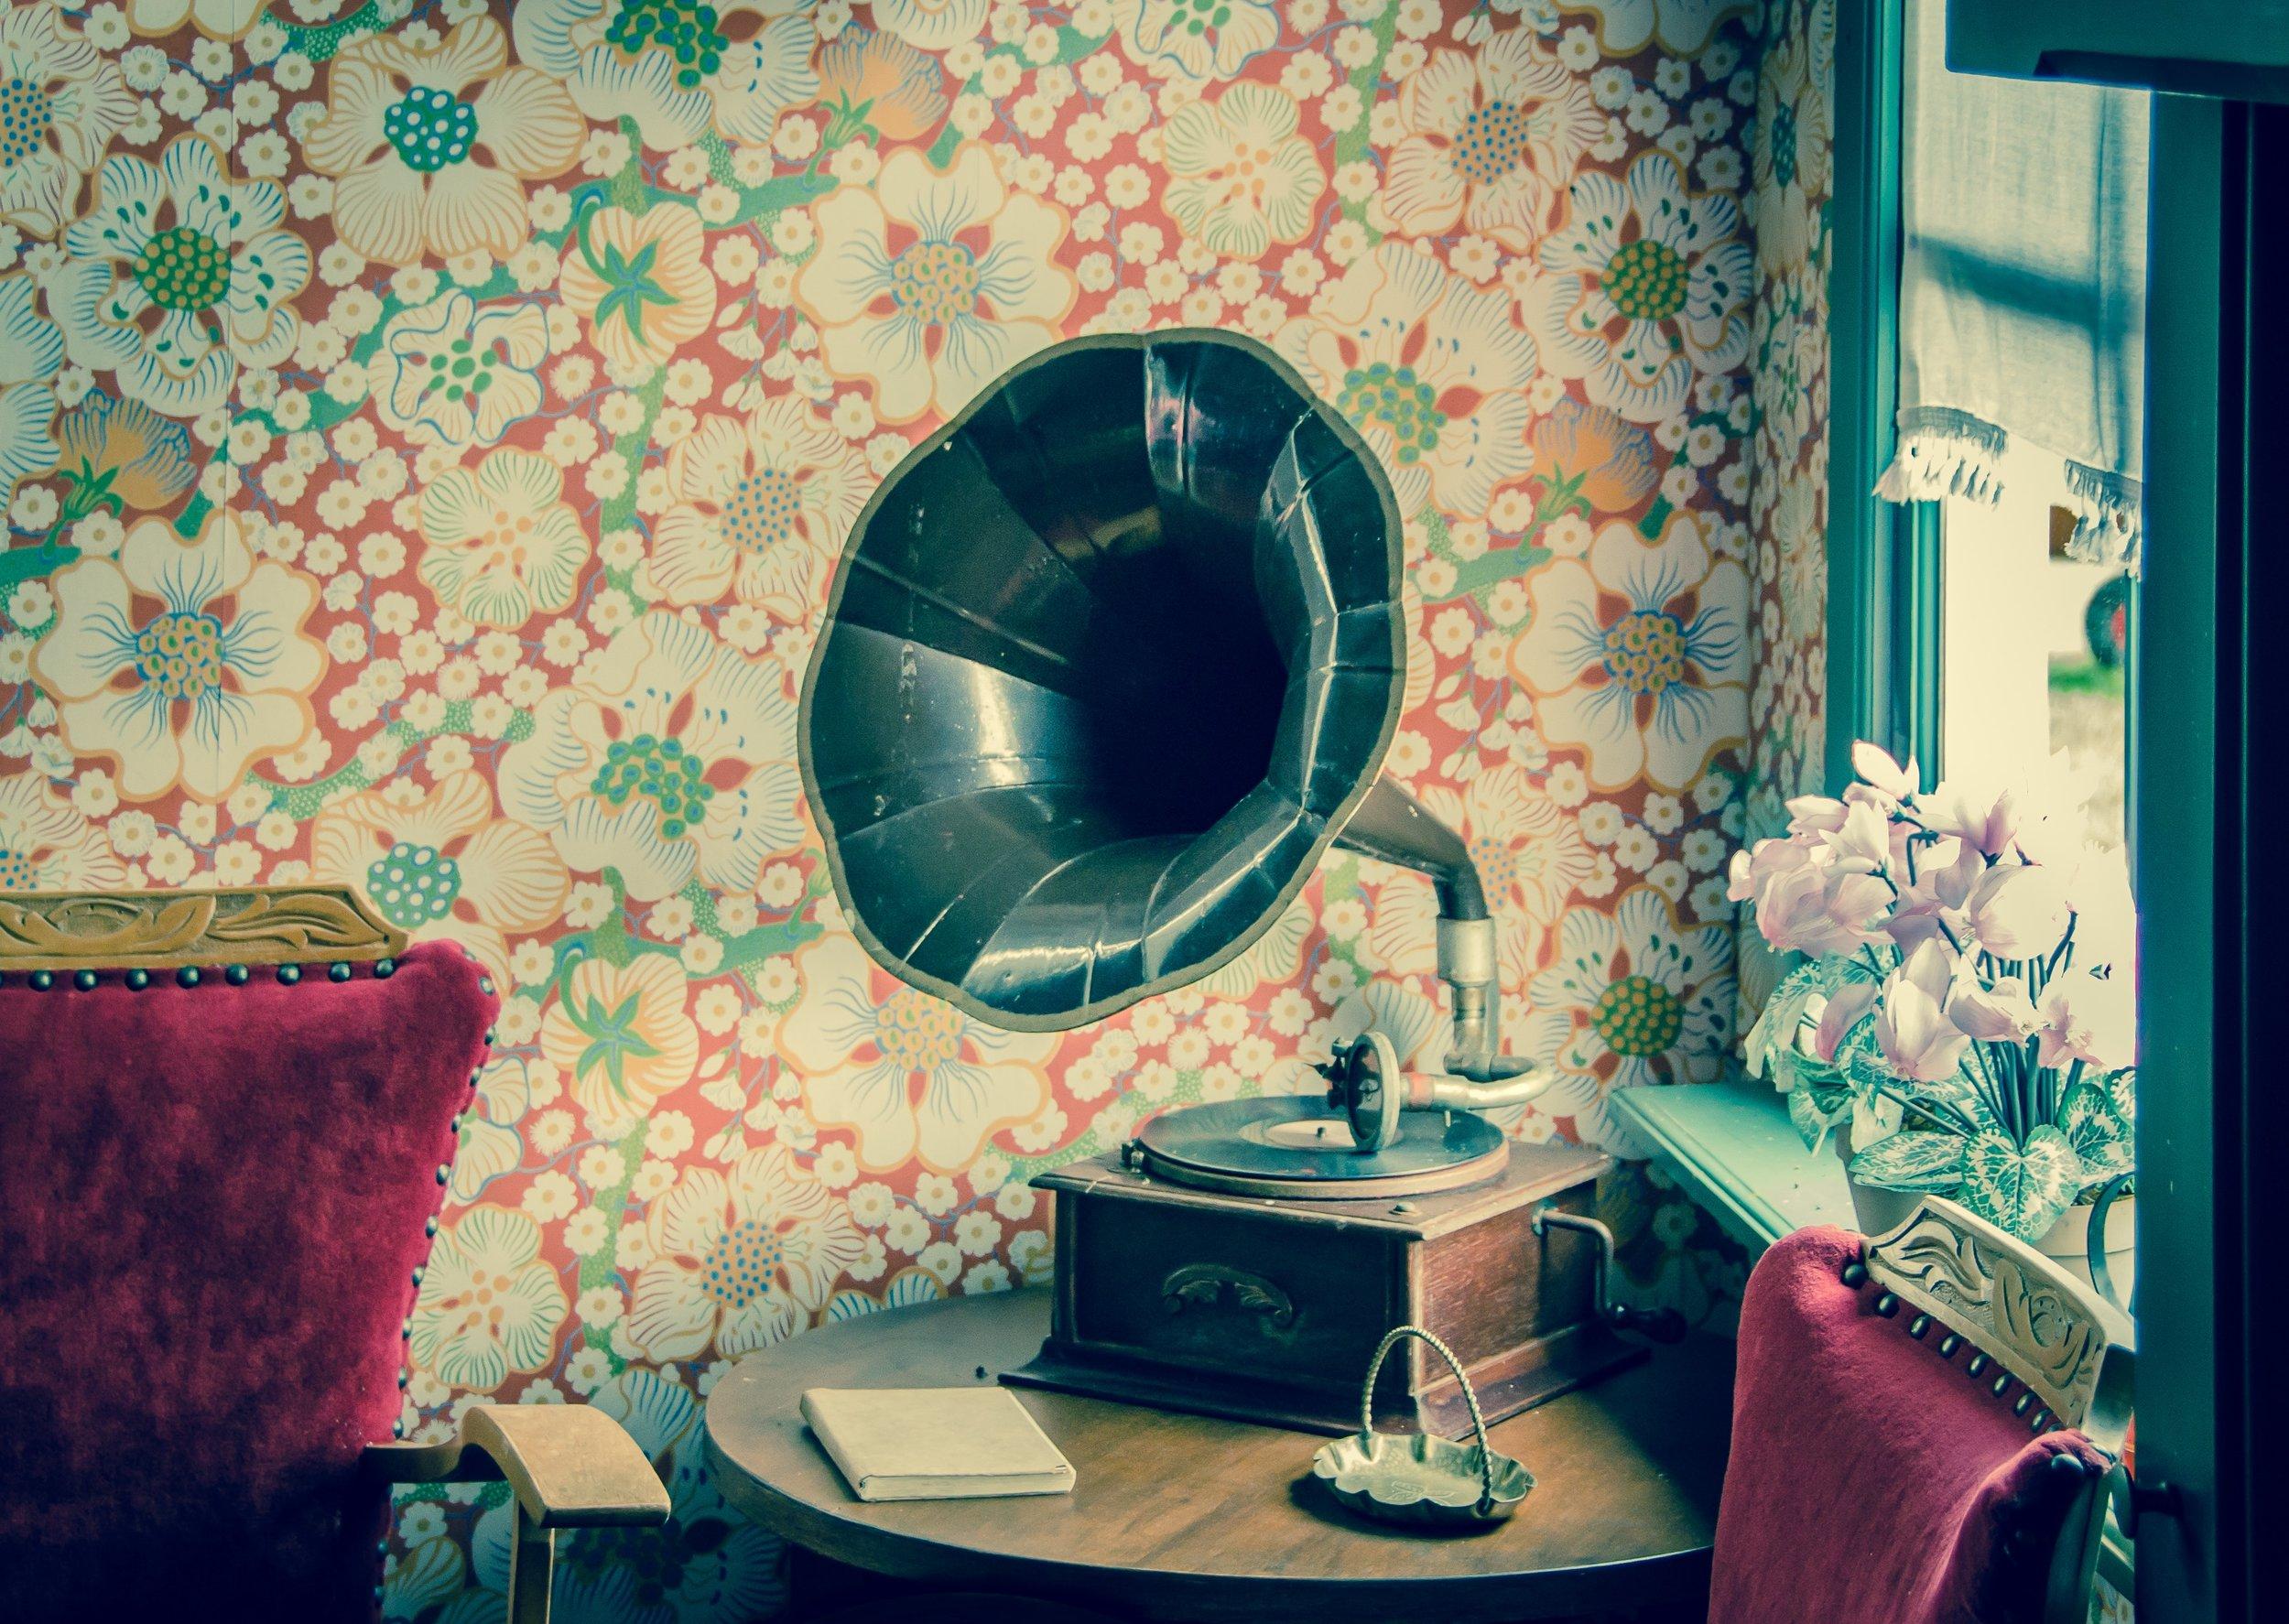 antique-audio-chair-594388.jpg